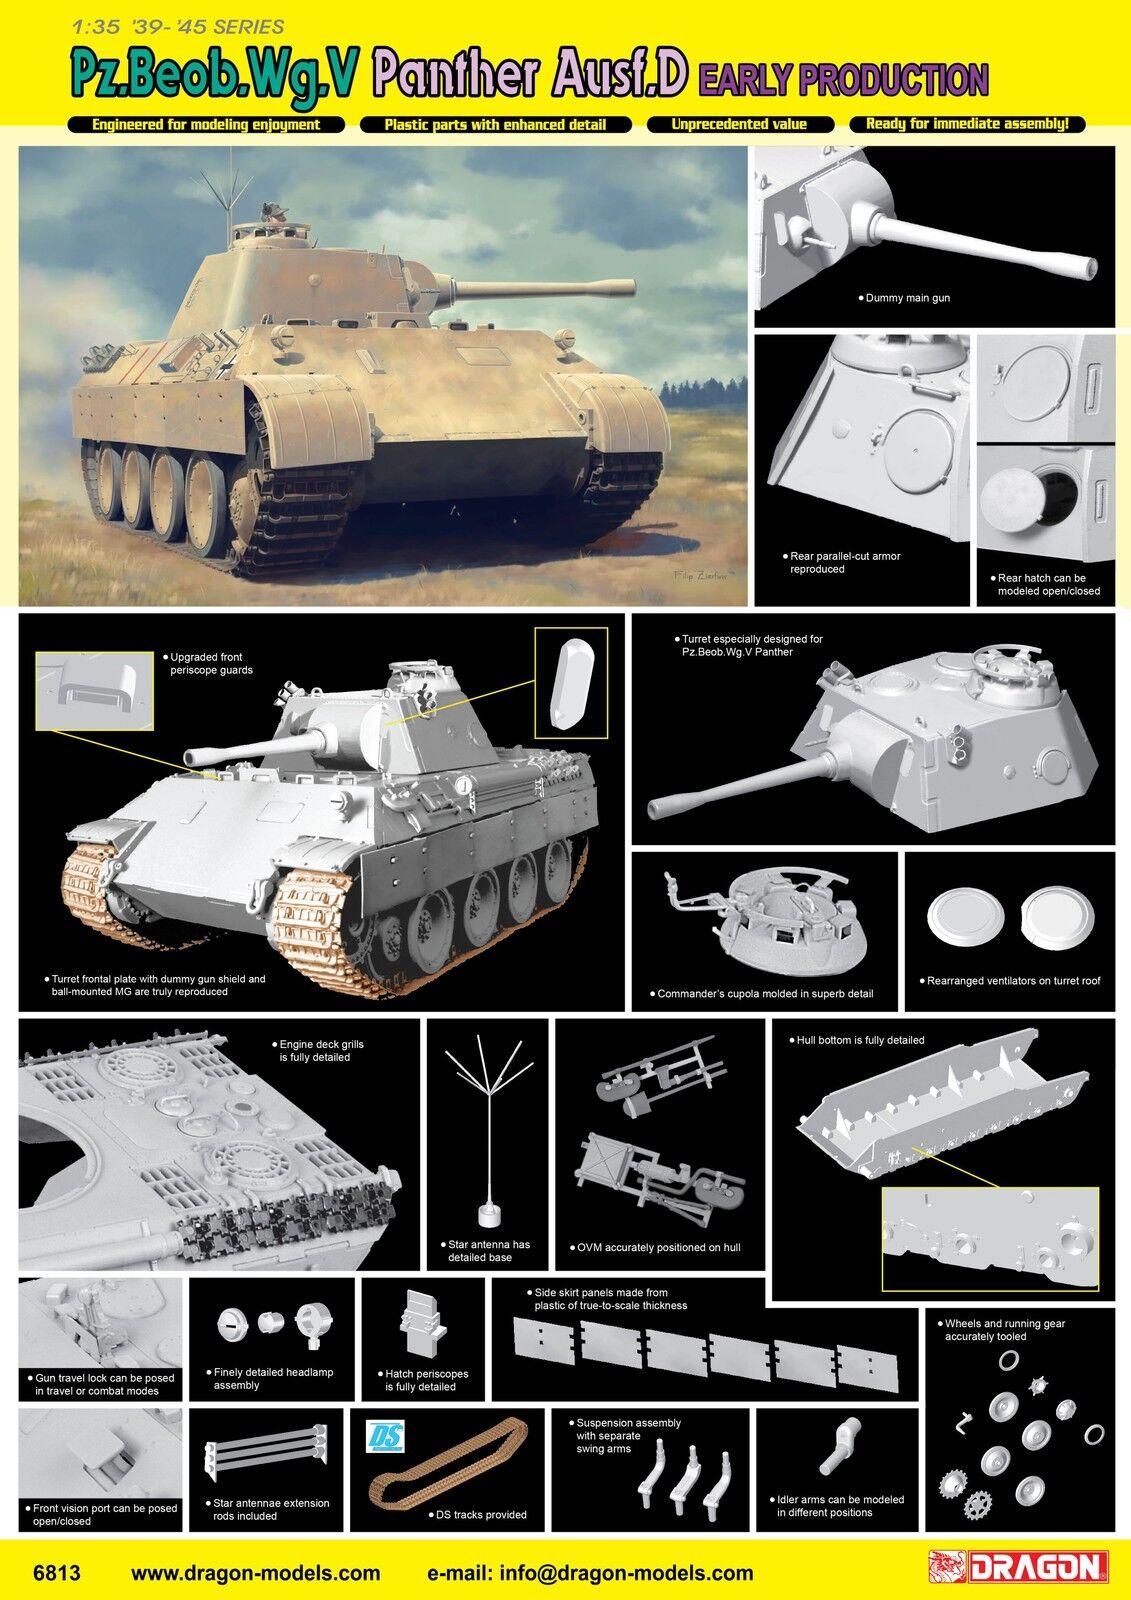 Dragon 1 35 Pz.Beob.Wg. V Ausf. D Early Production Plastic Model Kit